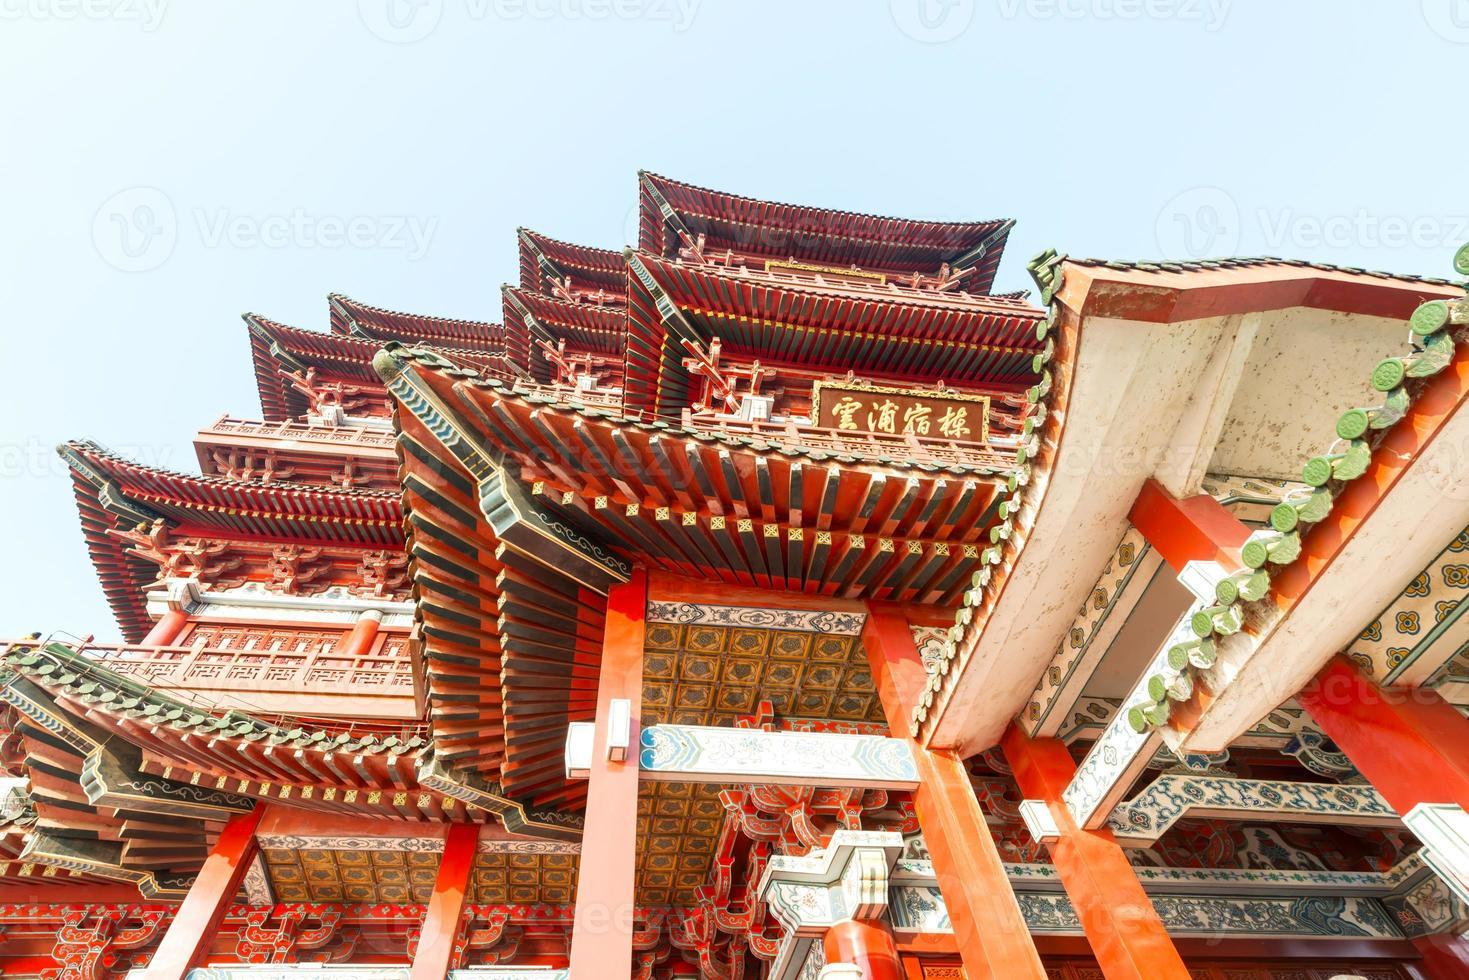 Tengwang Pavilion,Nanchang,t raditional, ancient Chinese archite photo